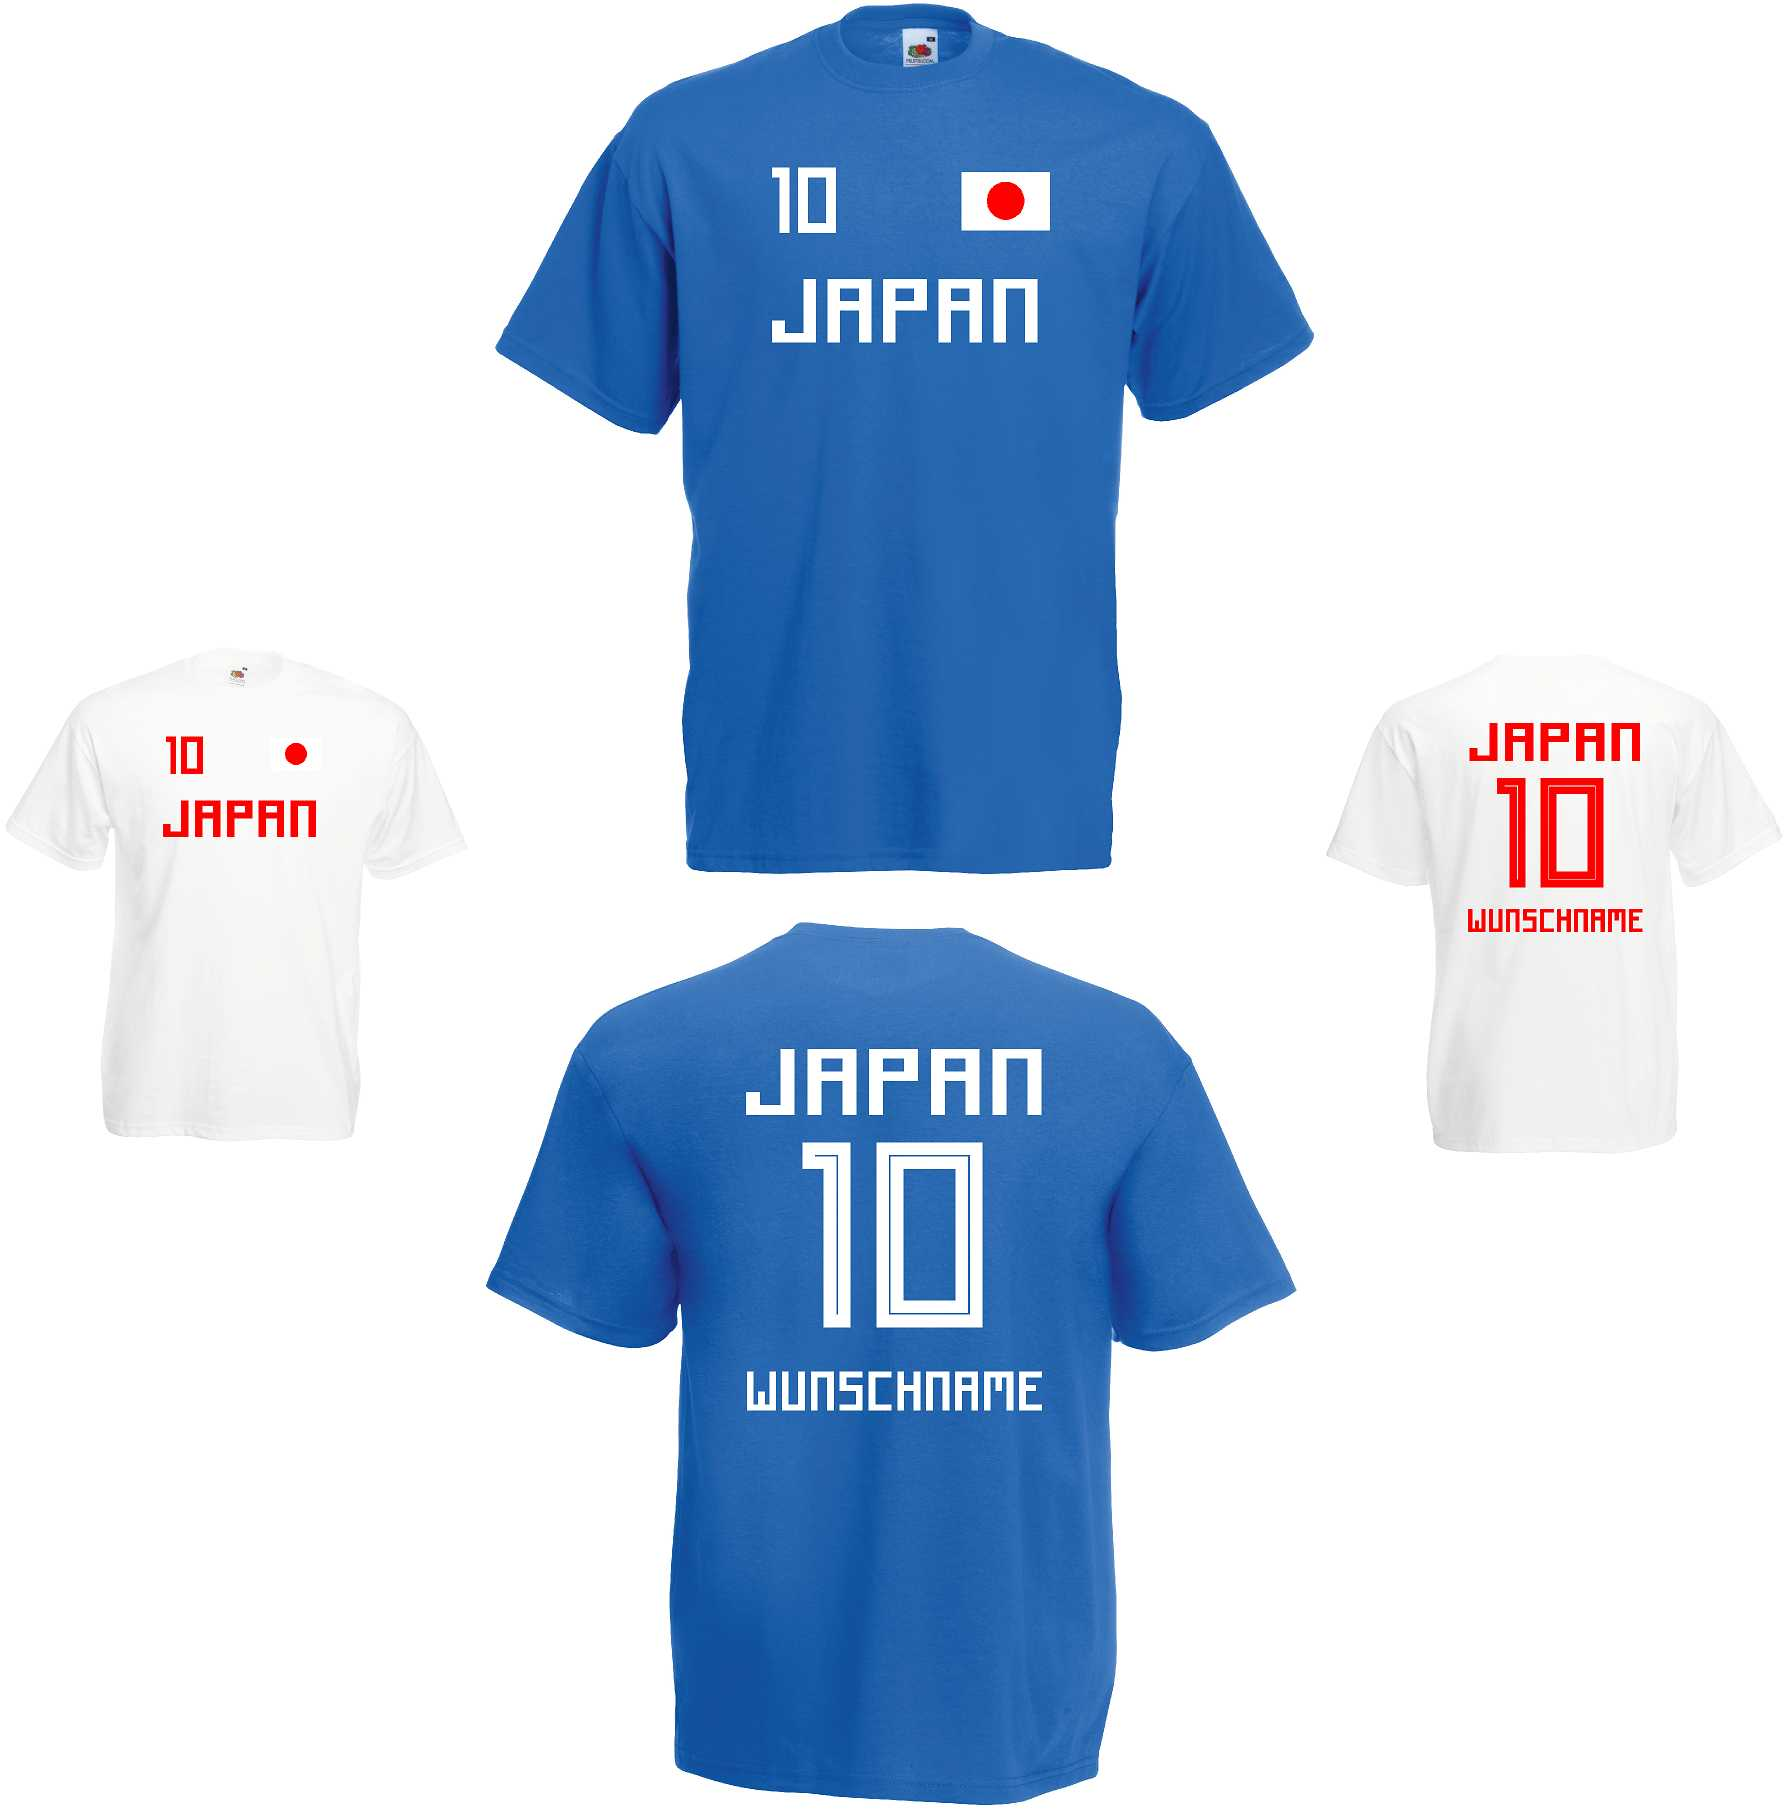 Frankreich France WM 2018 T-Shirt Trikot Look Fußball inkl.Druck  Name und Nr